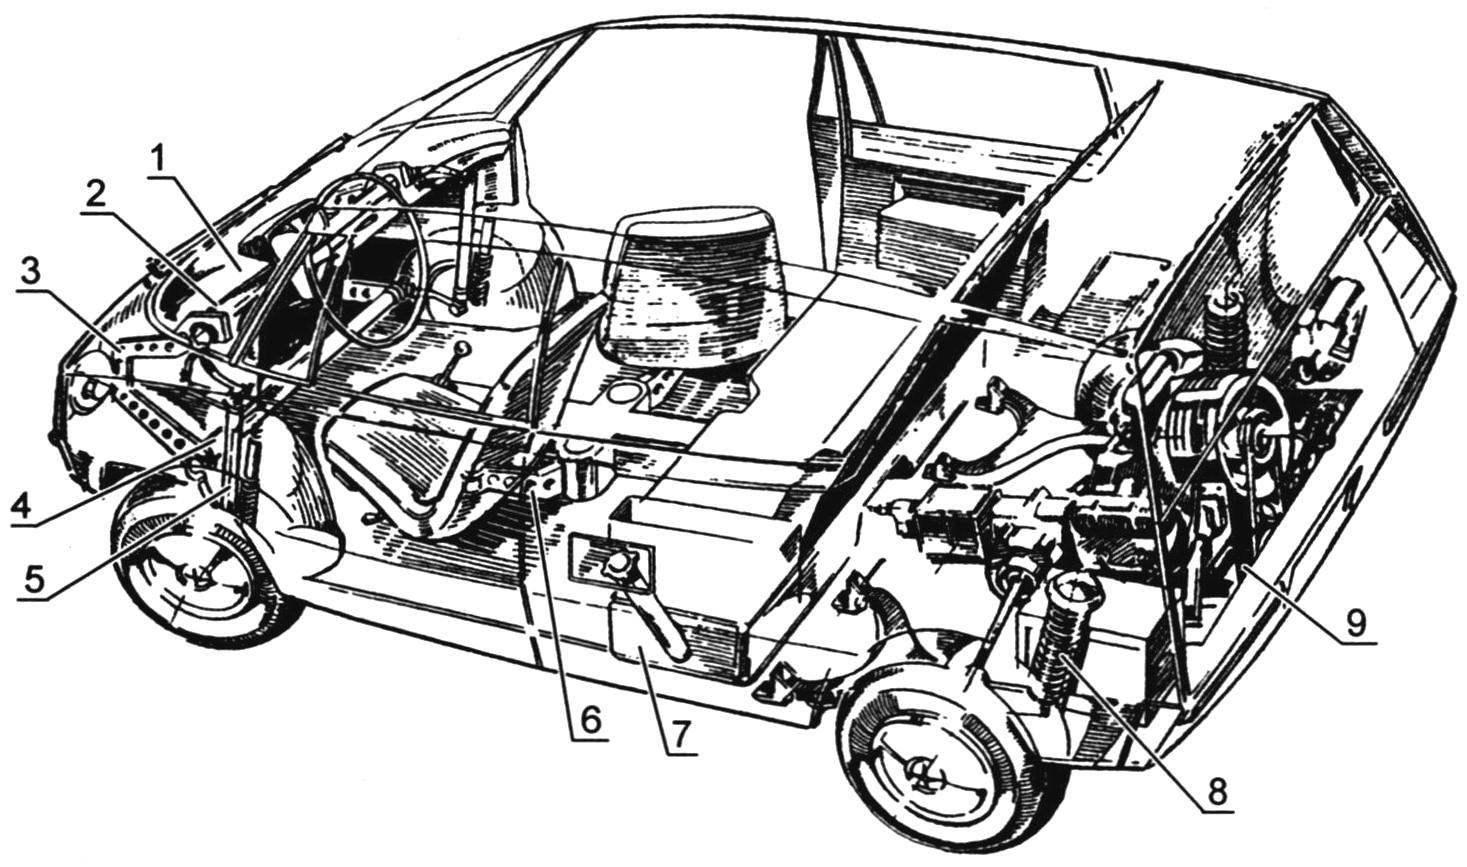 Компоновка автомобиля «Макси»